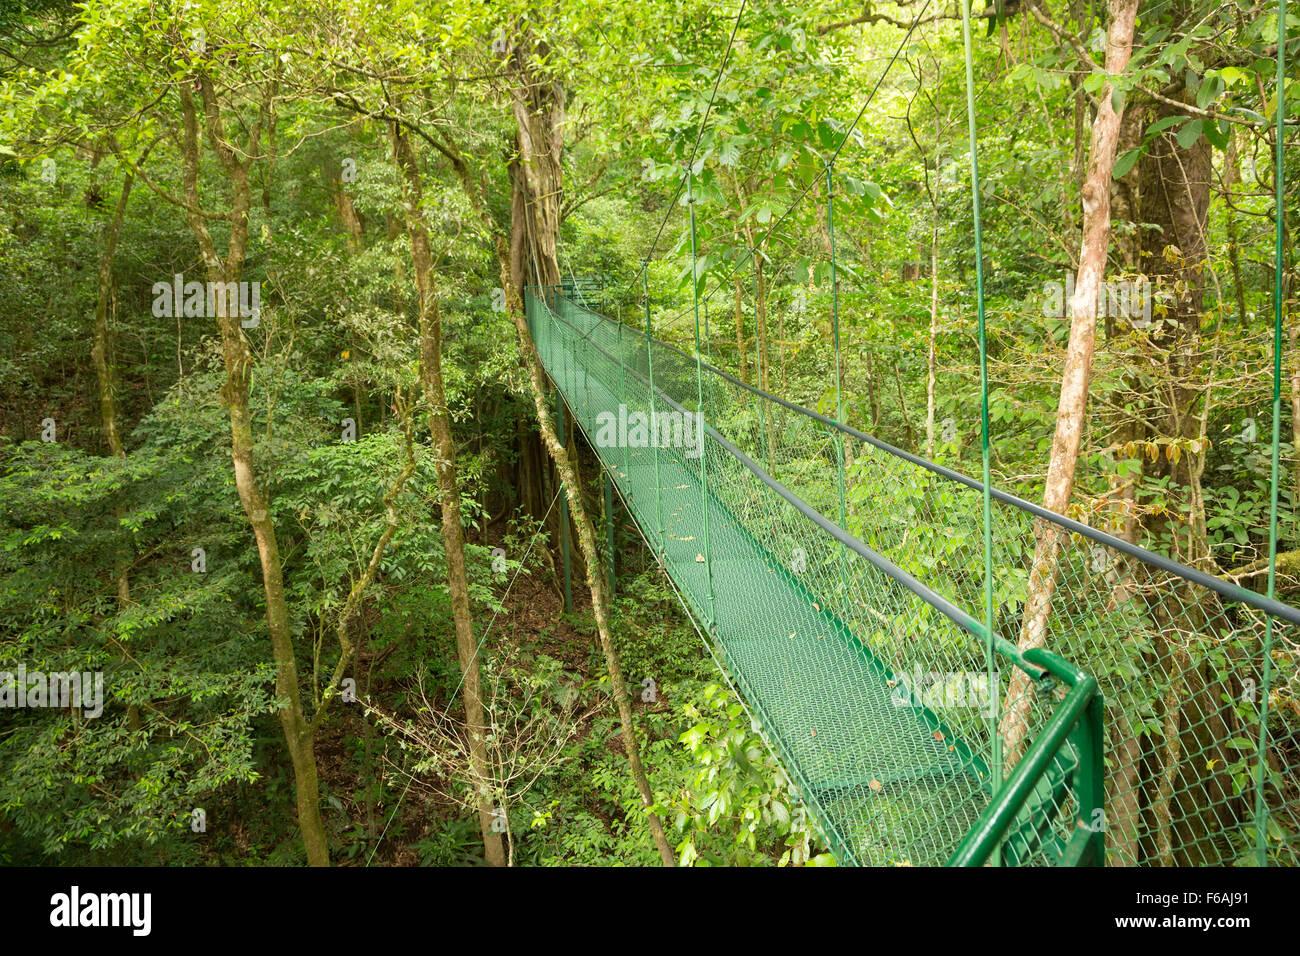 Suspended bridge at natural rainforest park, Costa Rica - Stock Image